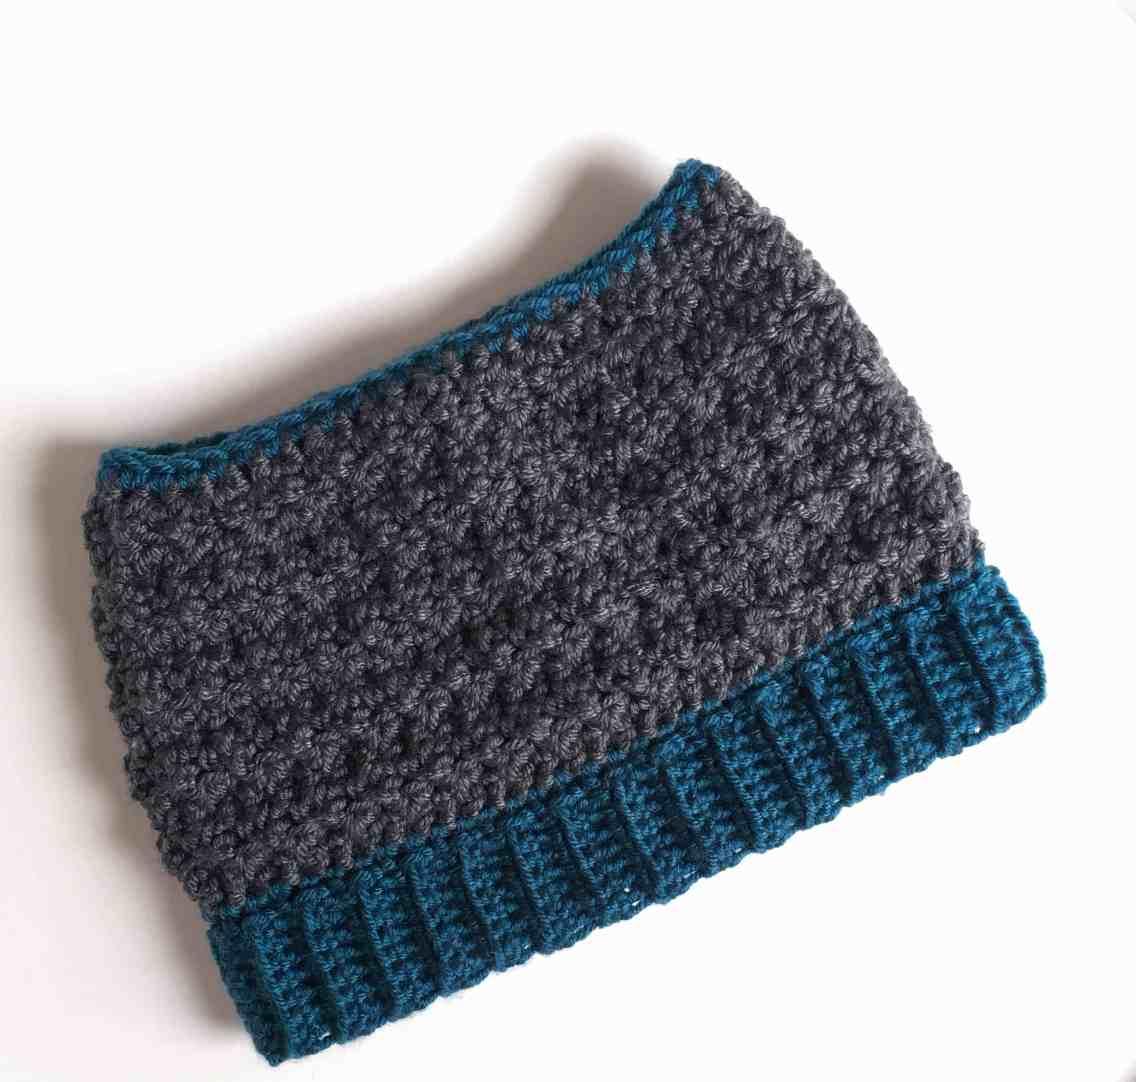 crochet textured messy bun hat ribbed brim